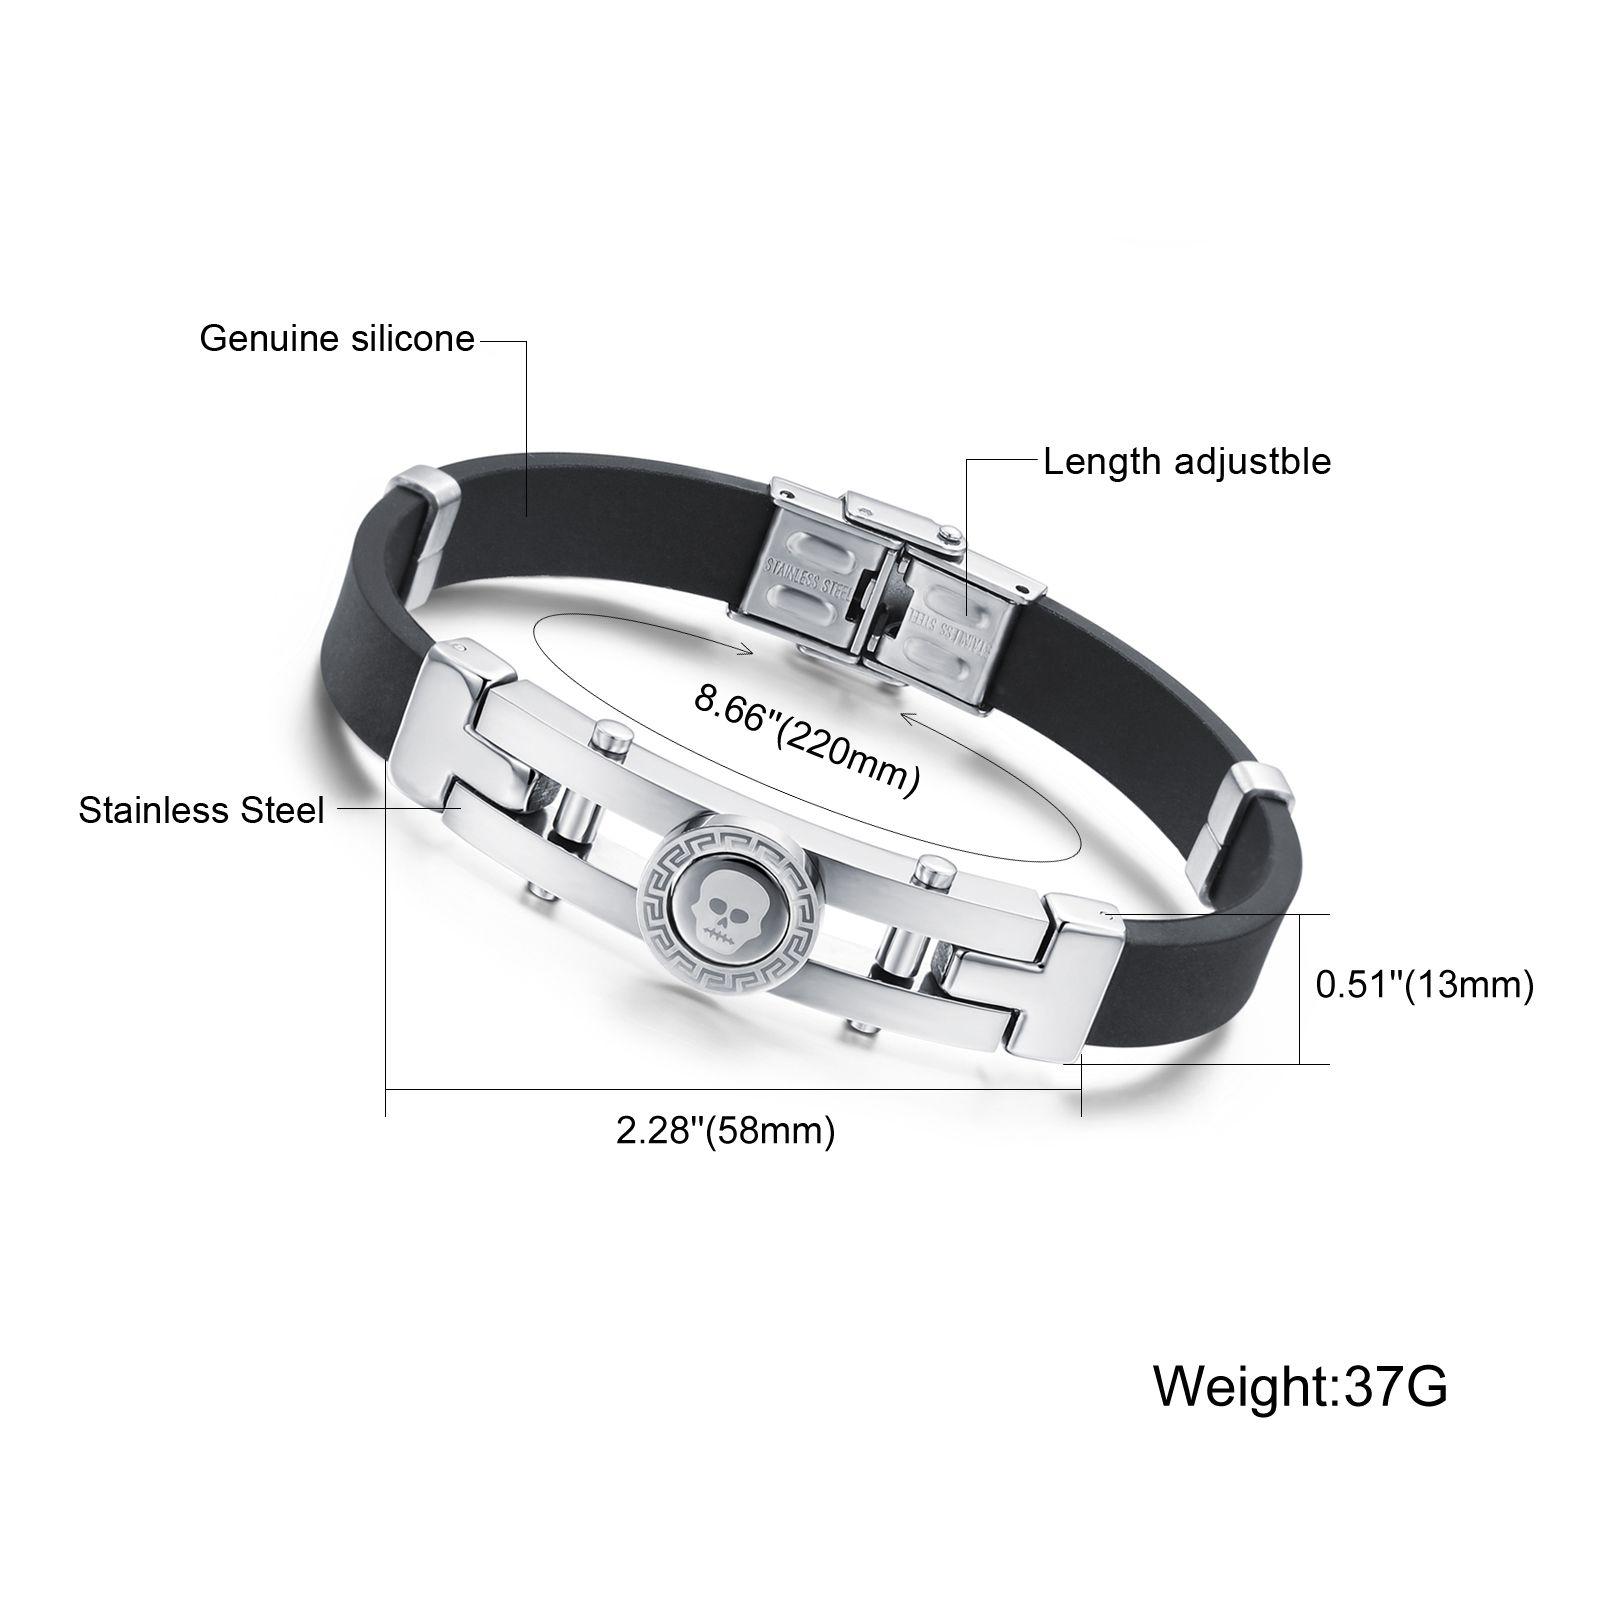 Silberton Männer Echte Silikon Edelstahl Gothic Skull Clasp Fashion Armband 8,66